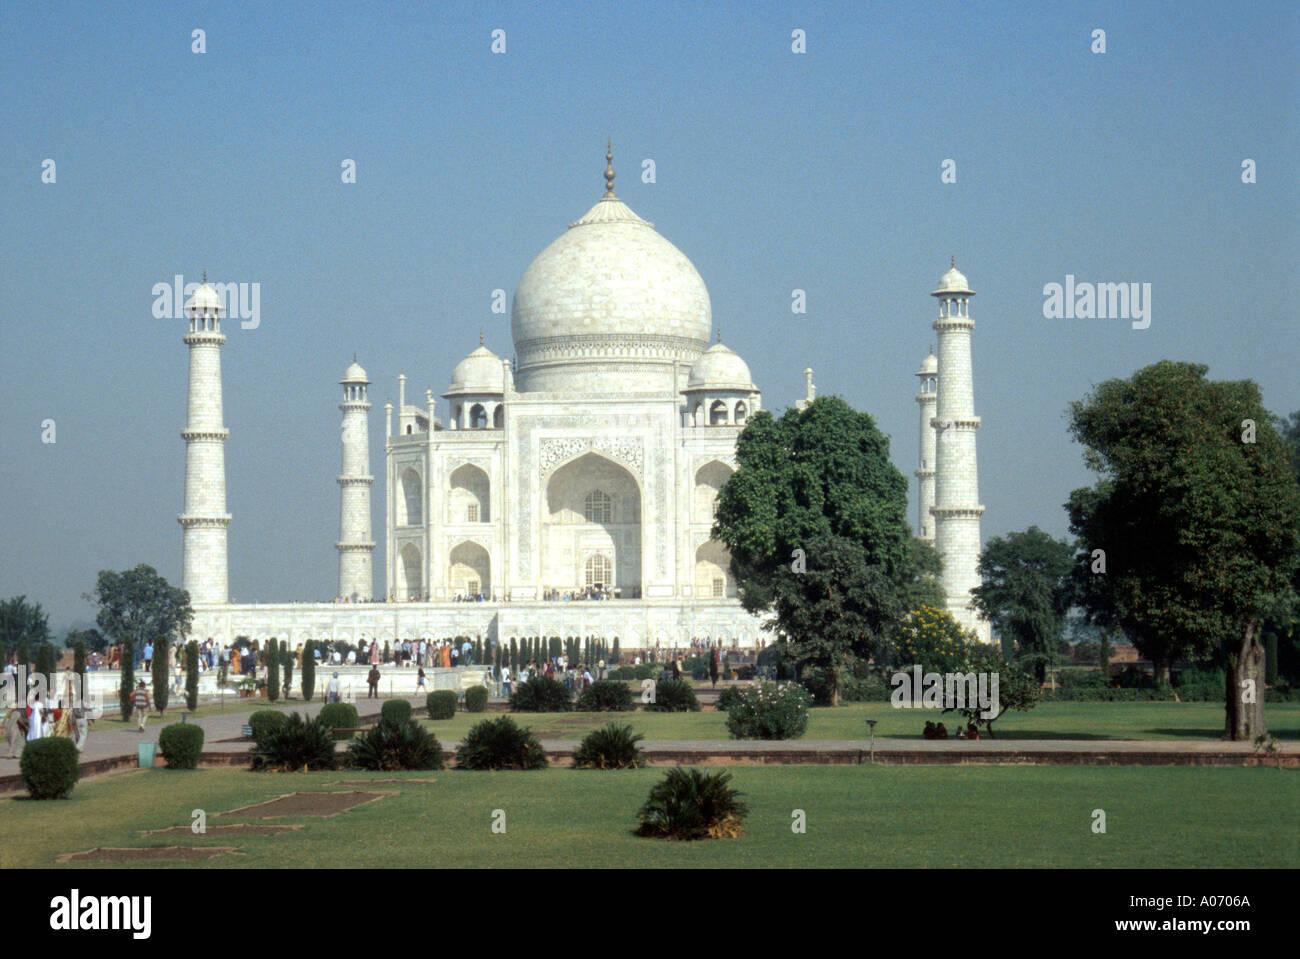 Taj Mahal, Agra, Rajasthan, India Stock Photo